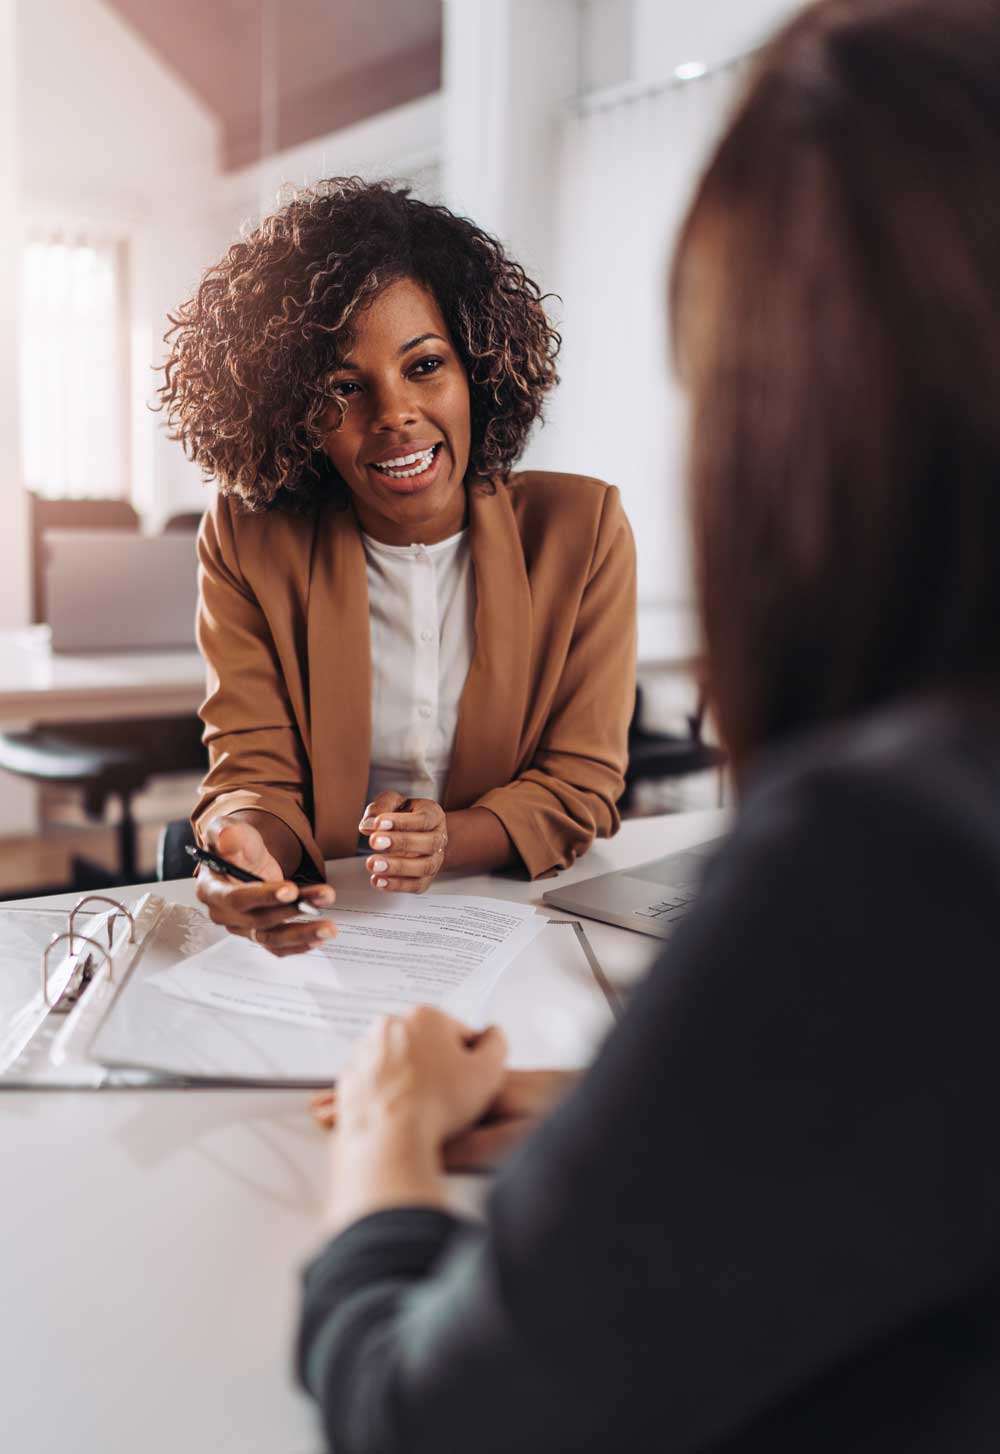 A women interviews a candidate for a foundation job